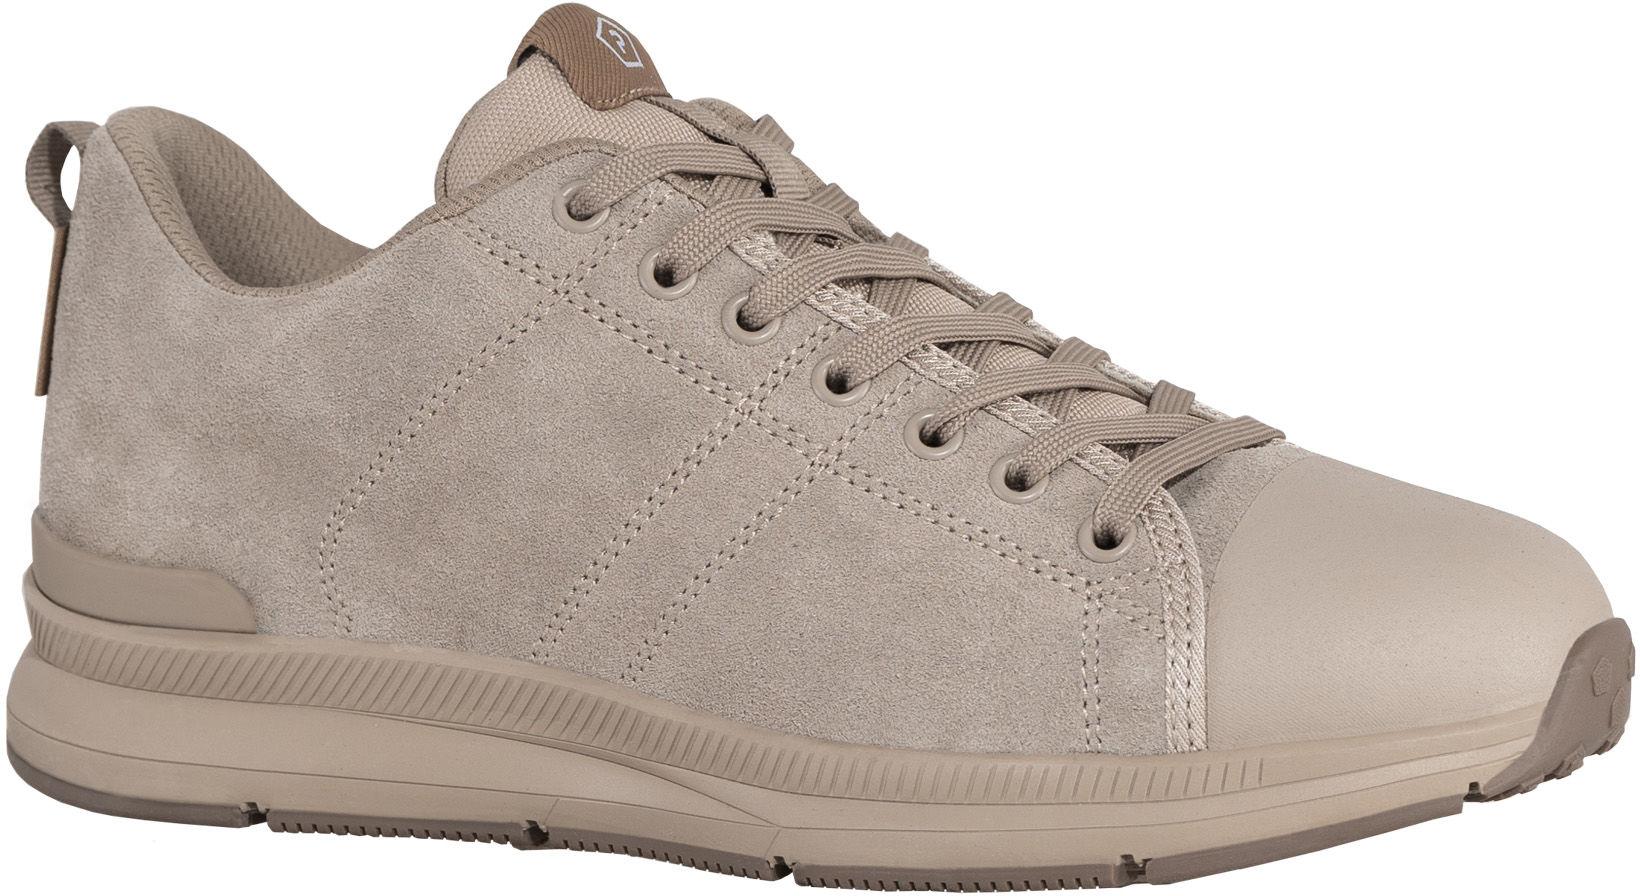 Buty Pentagon Hybrid Suede Shoes - Coyote (K15041-03)